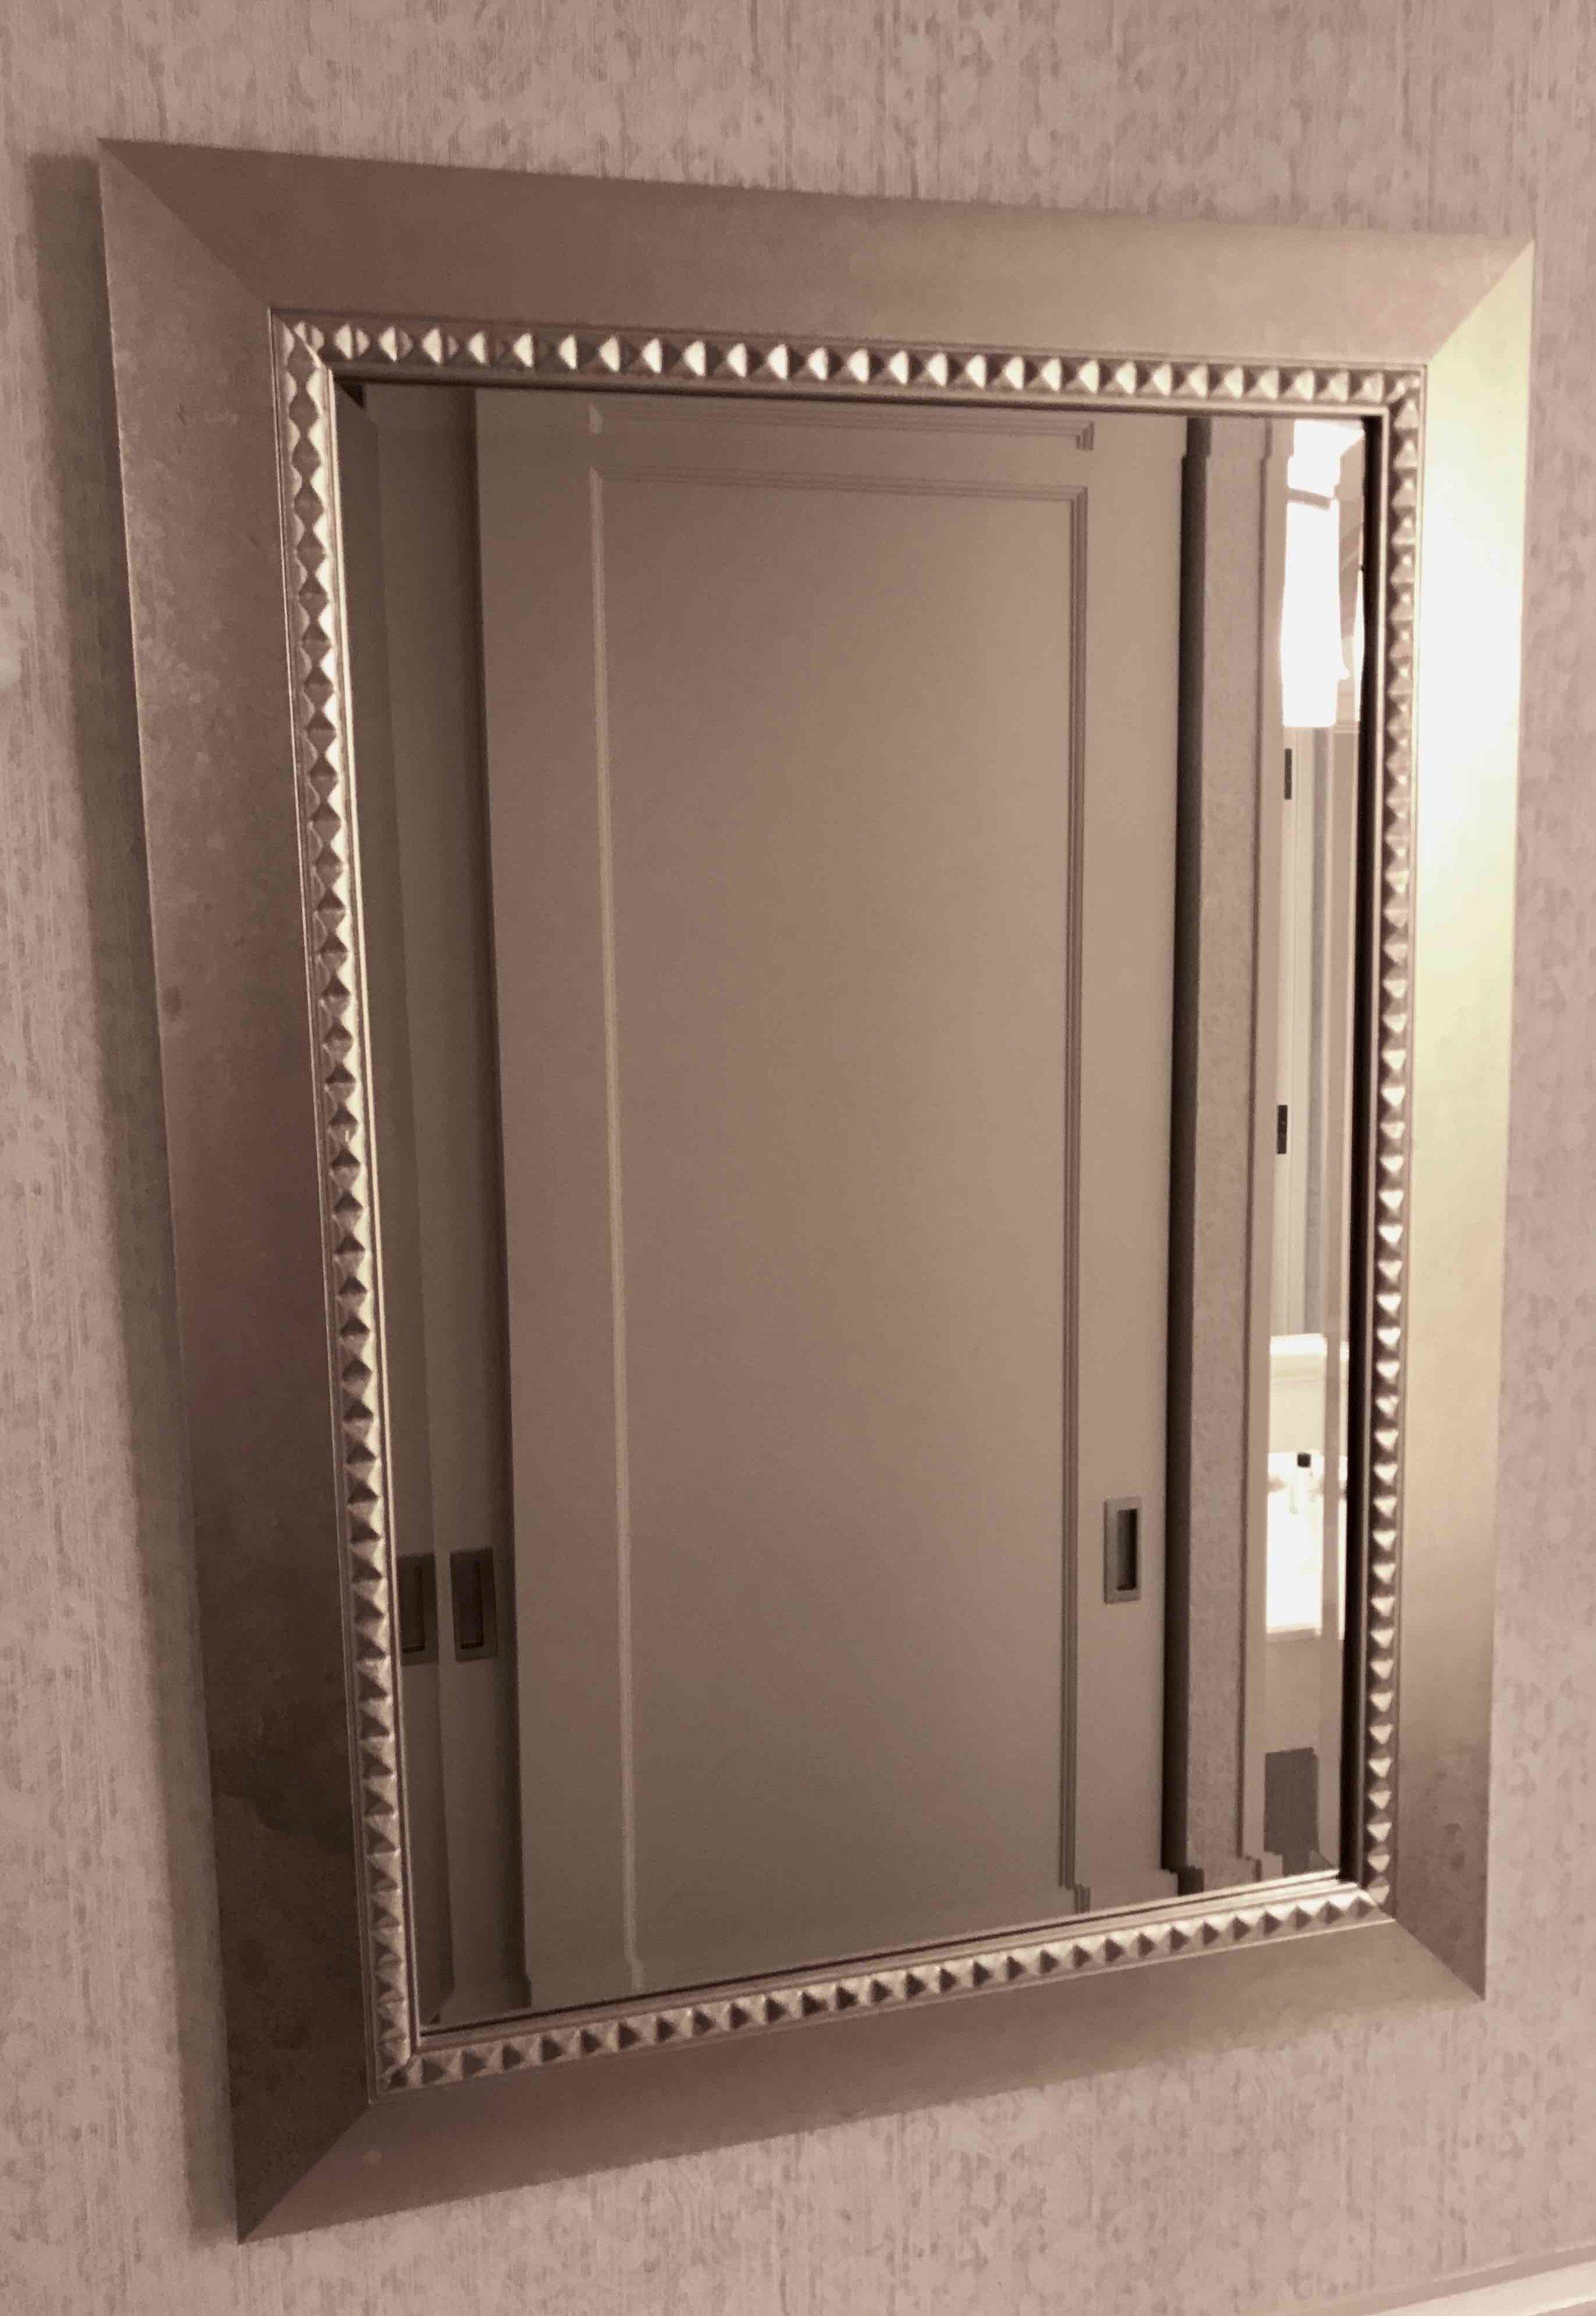 JW Gold Vanity Mirror w/Beveled Glass